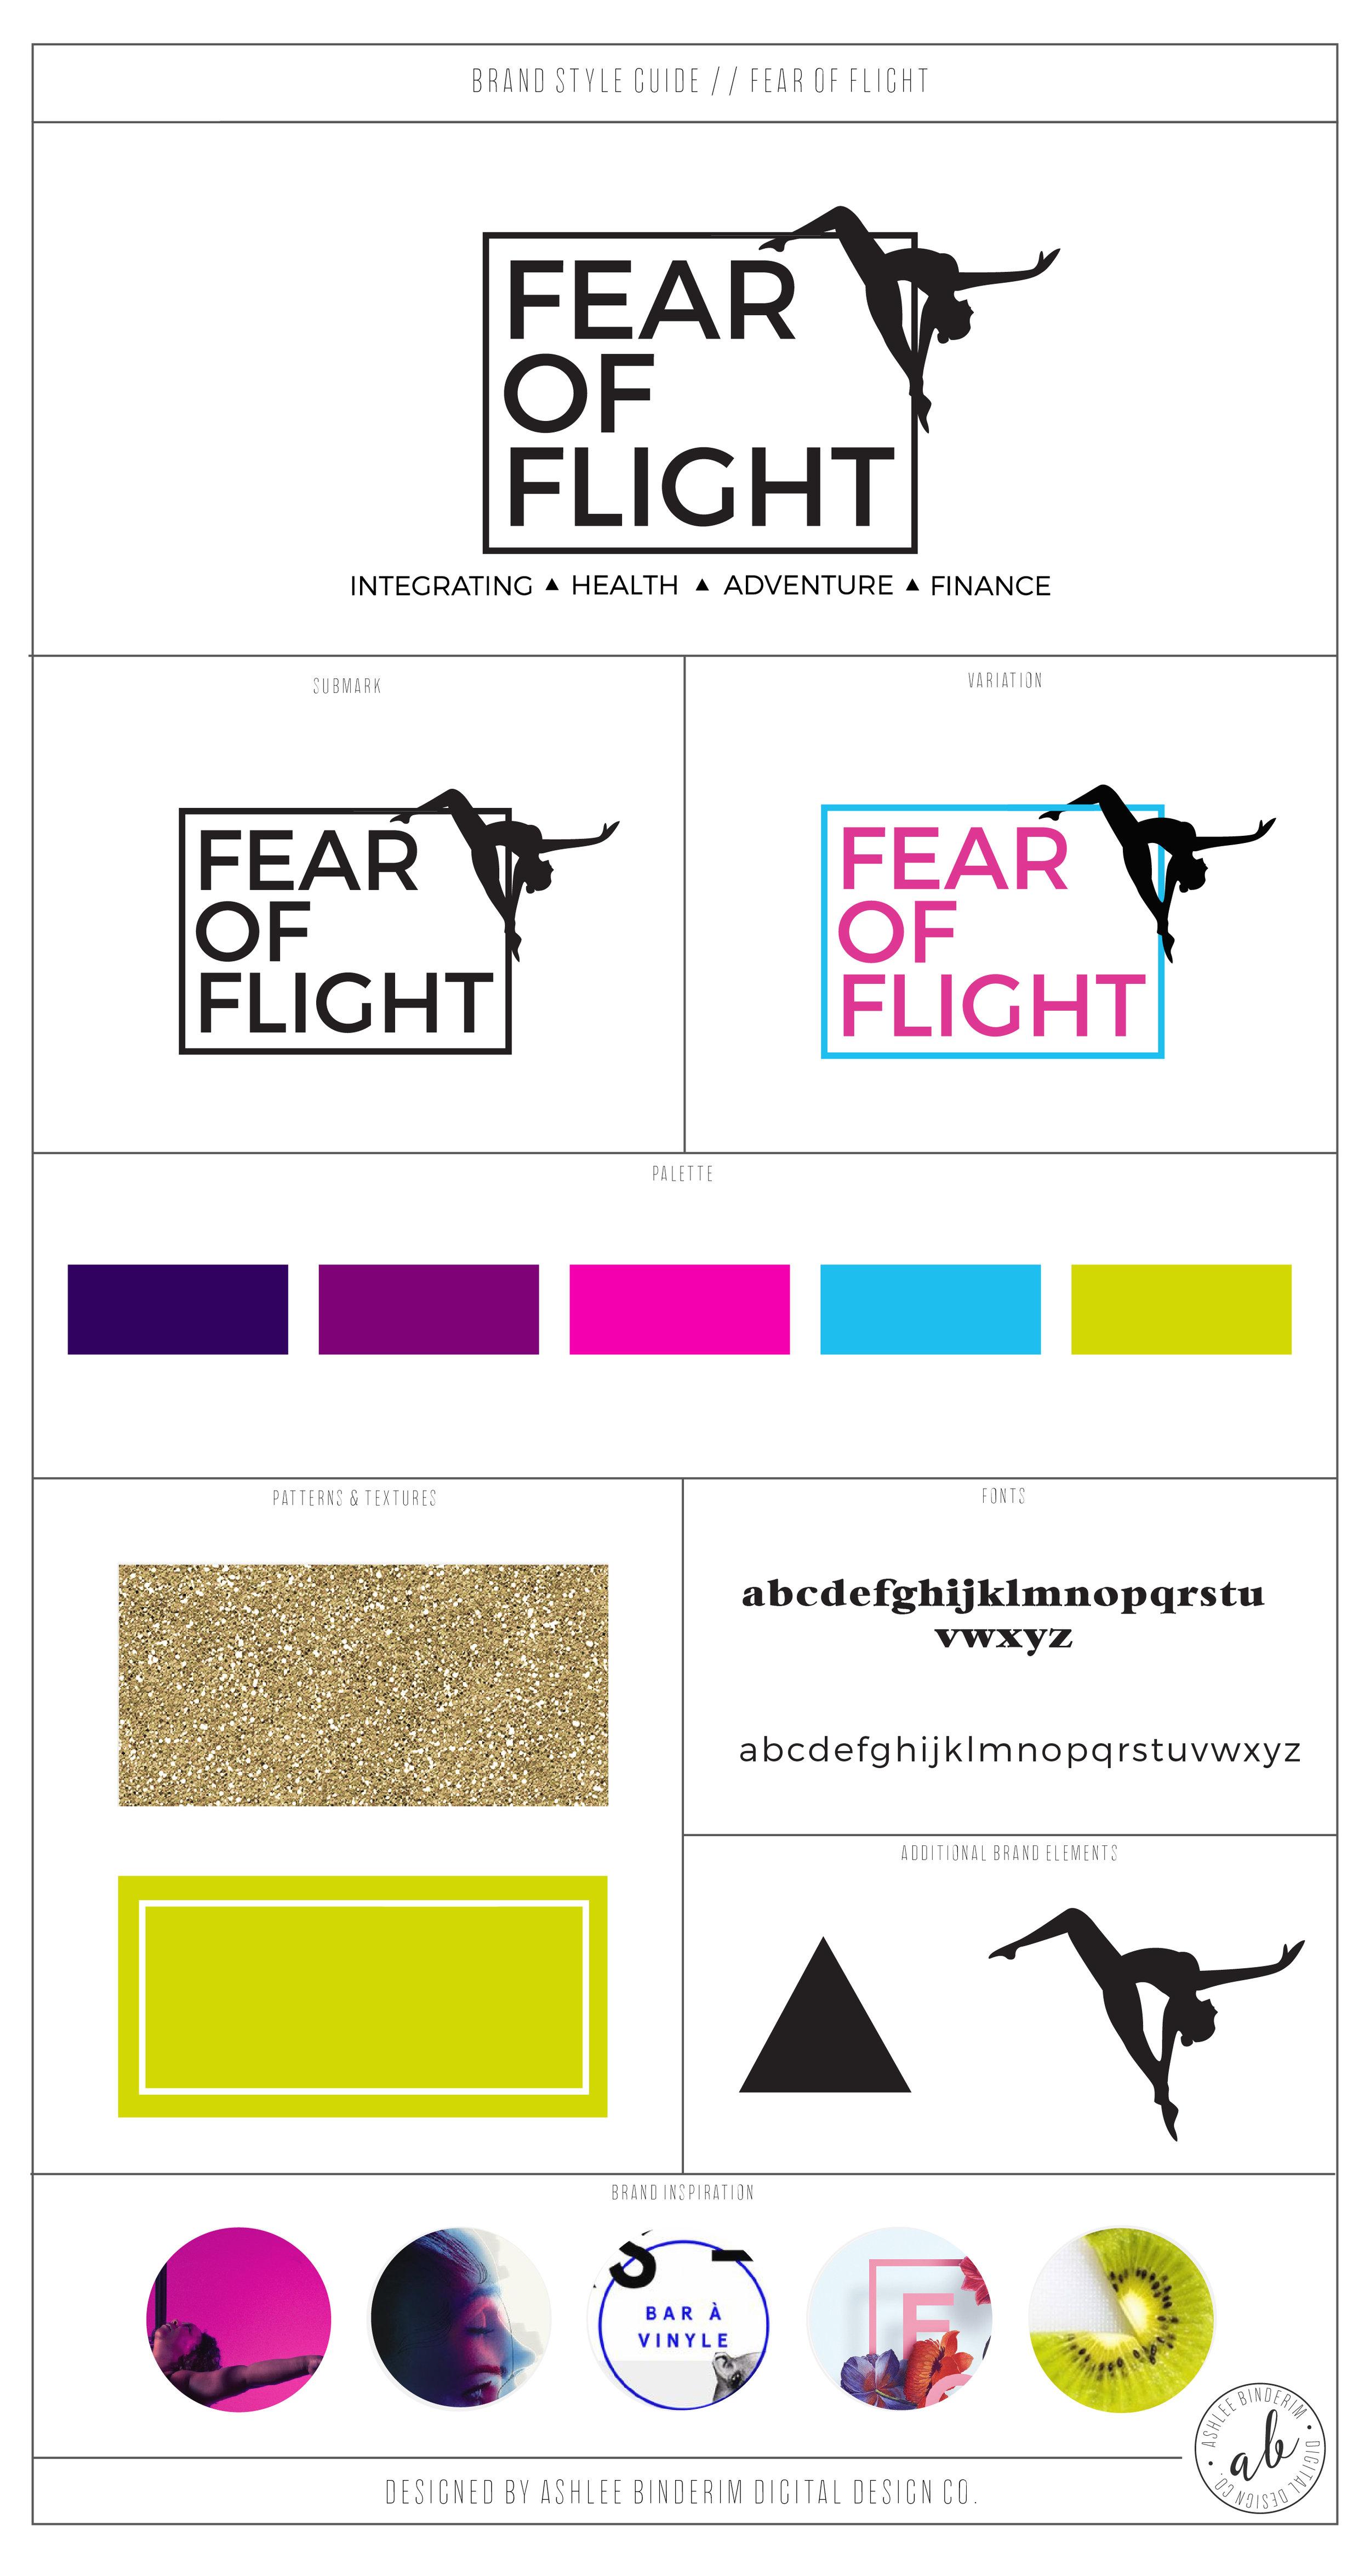 Fear of Flight Brand Style Guide